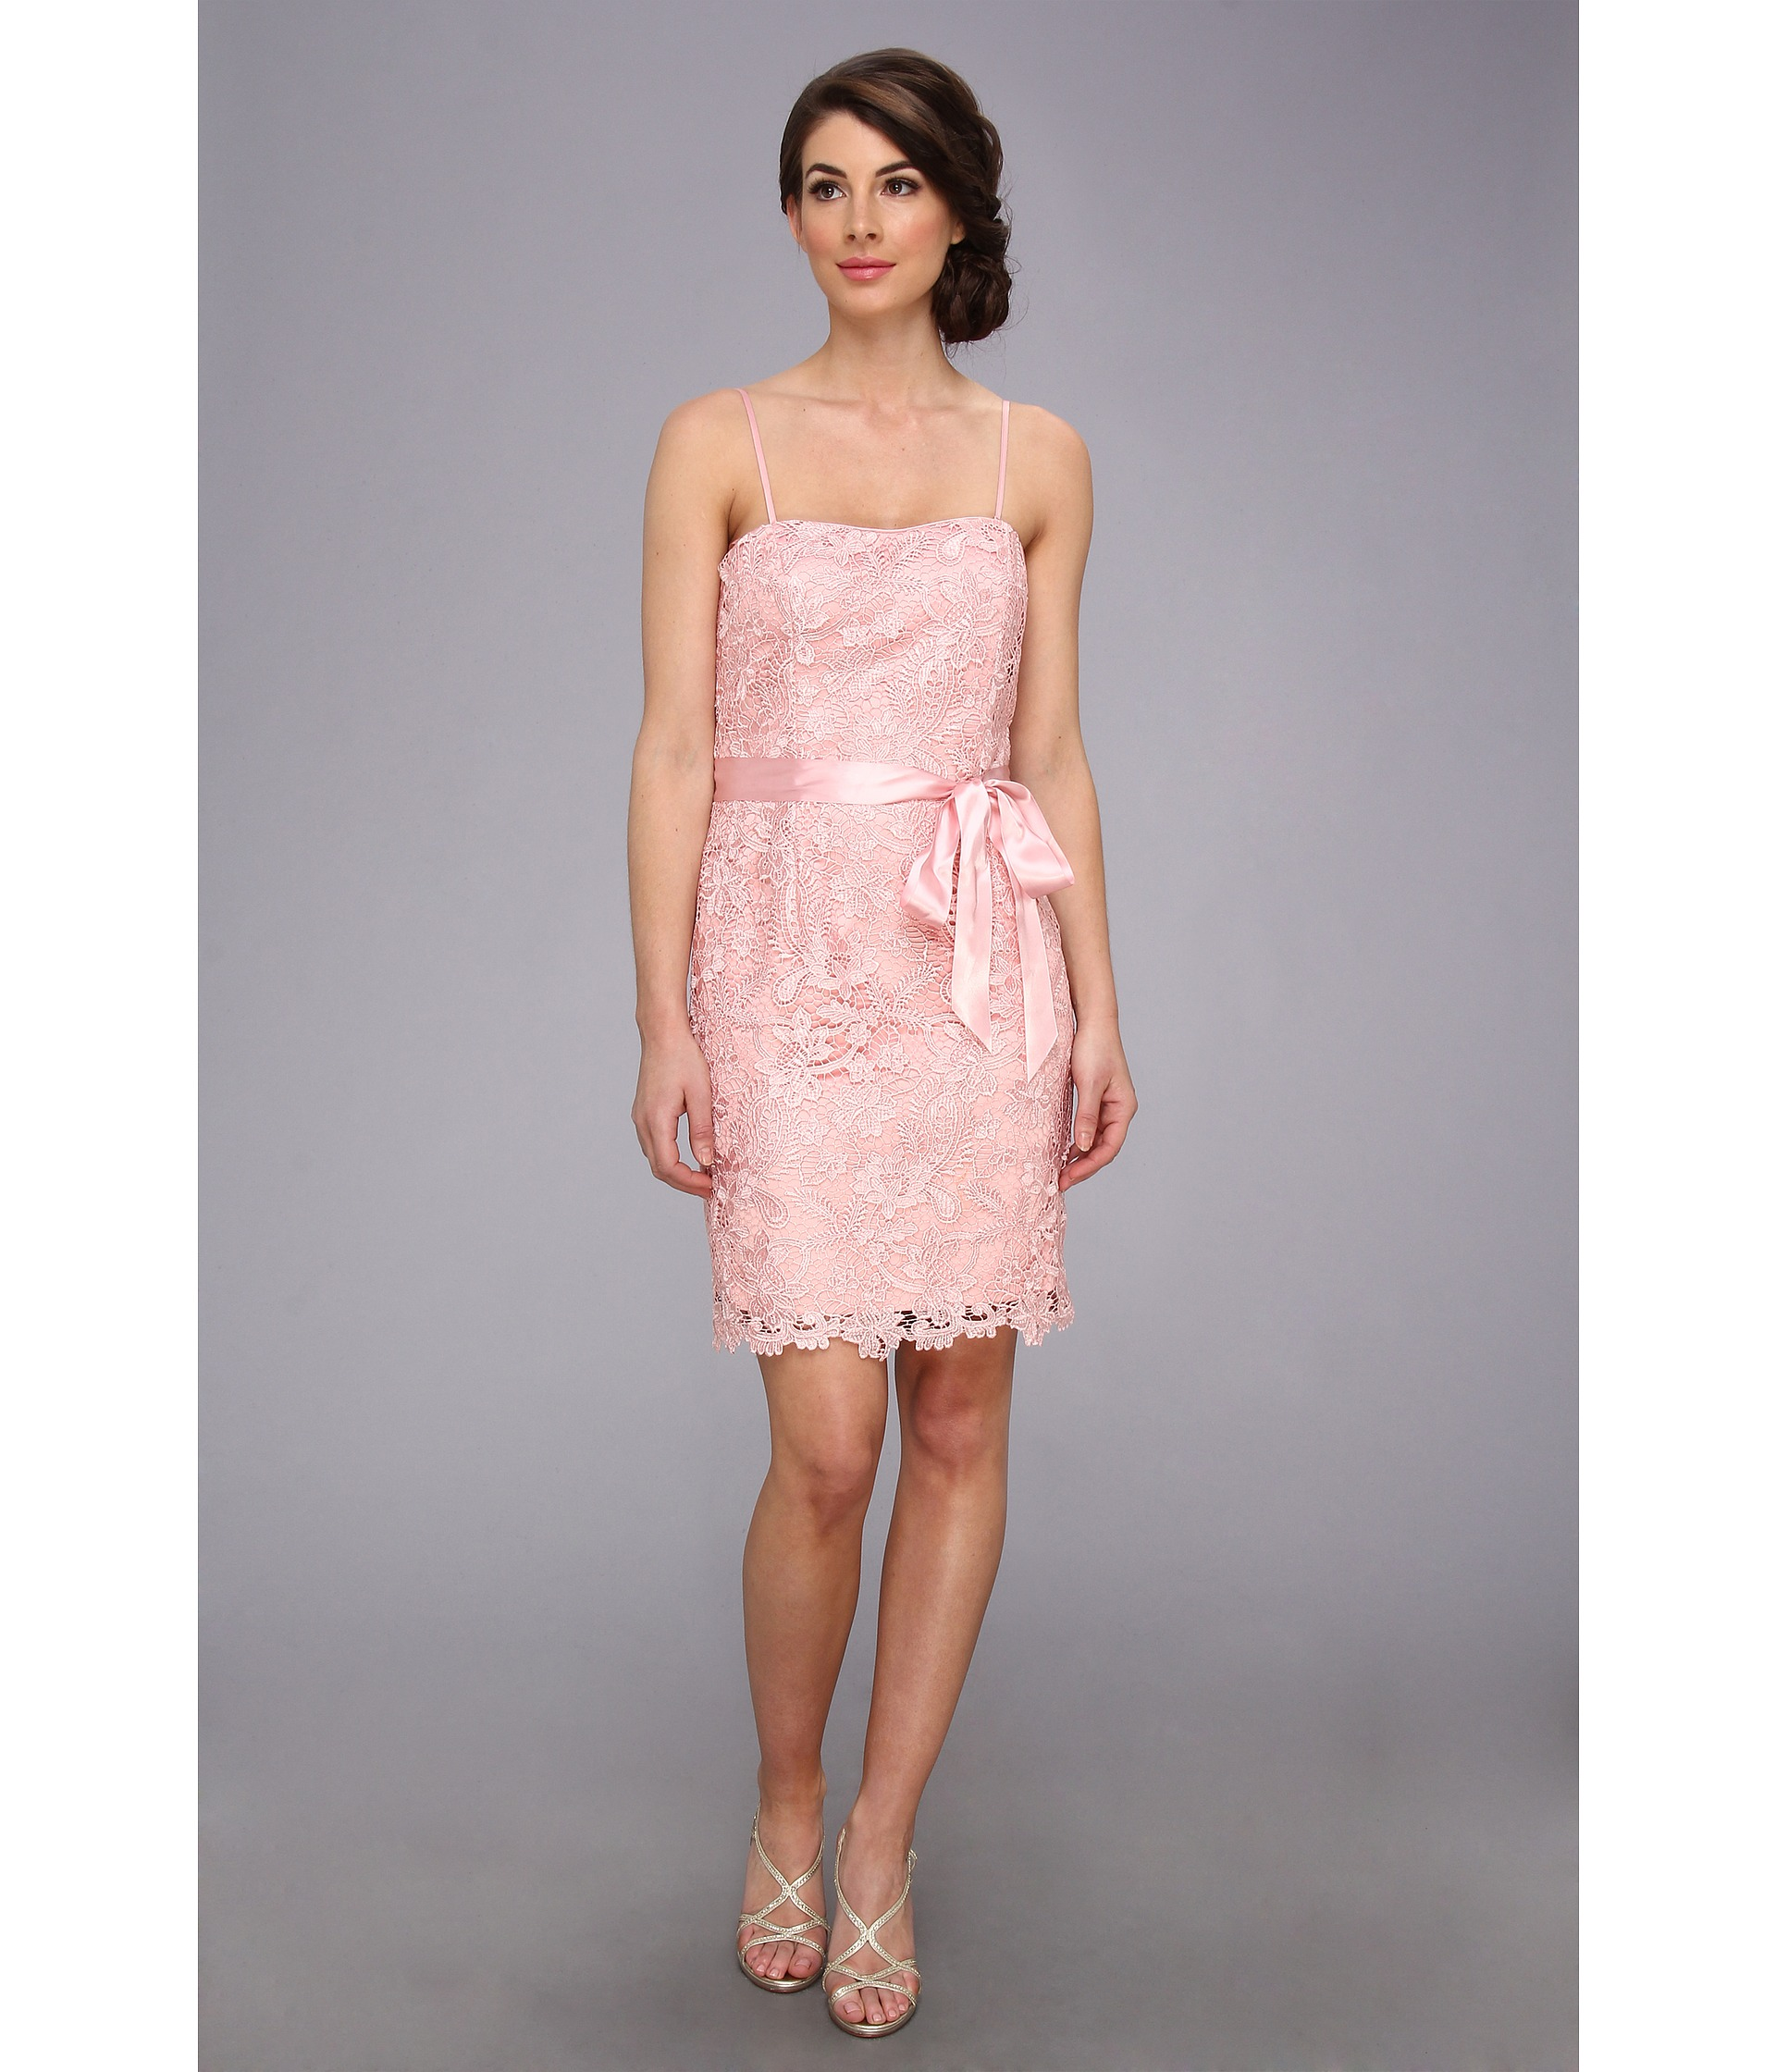 Strapless lace sheath dress - Fashion dresses